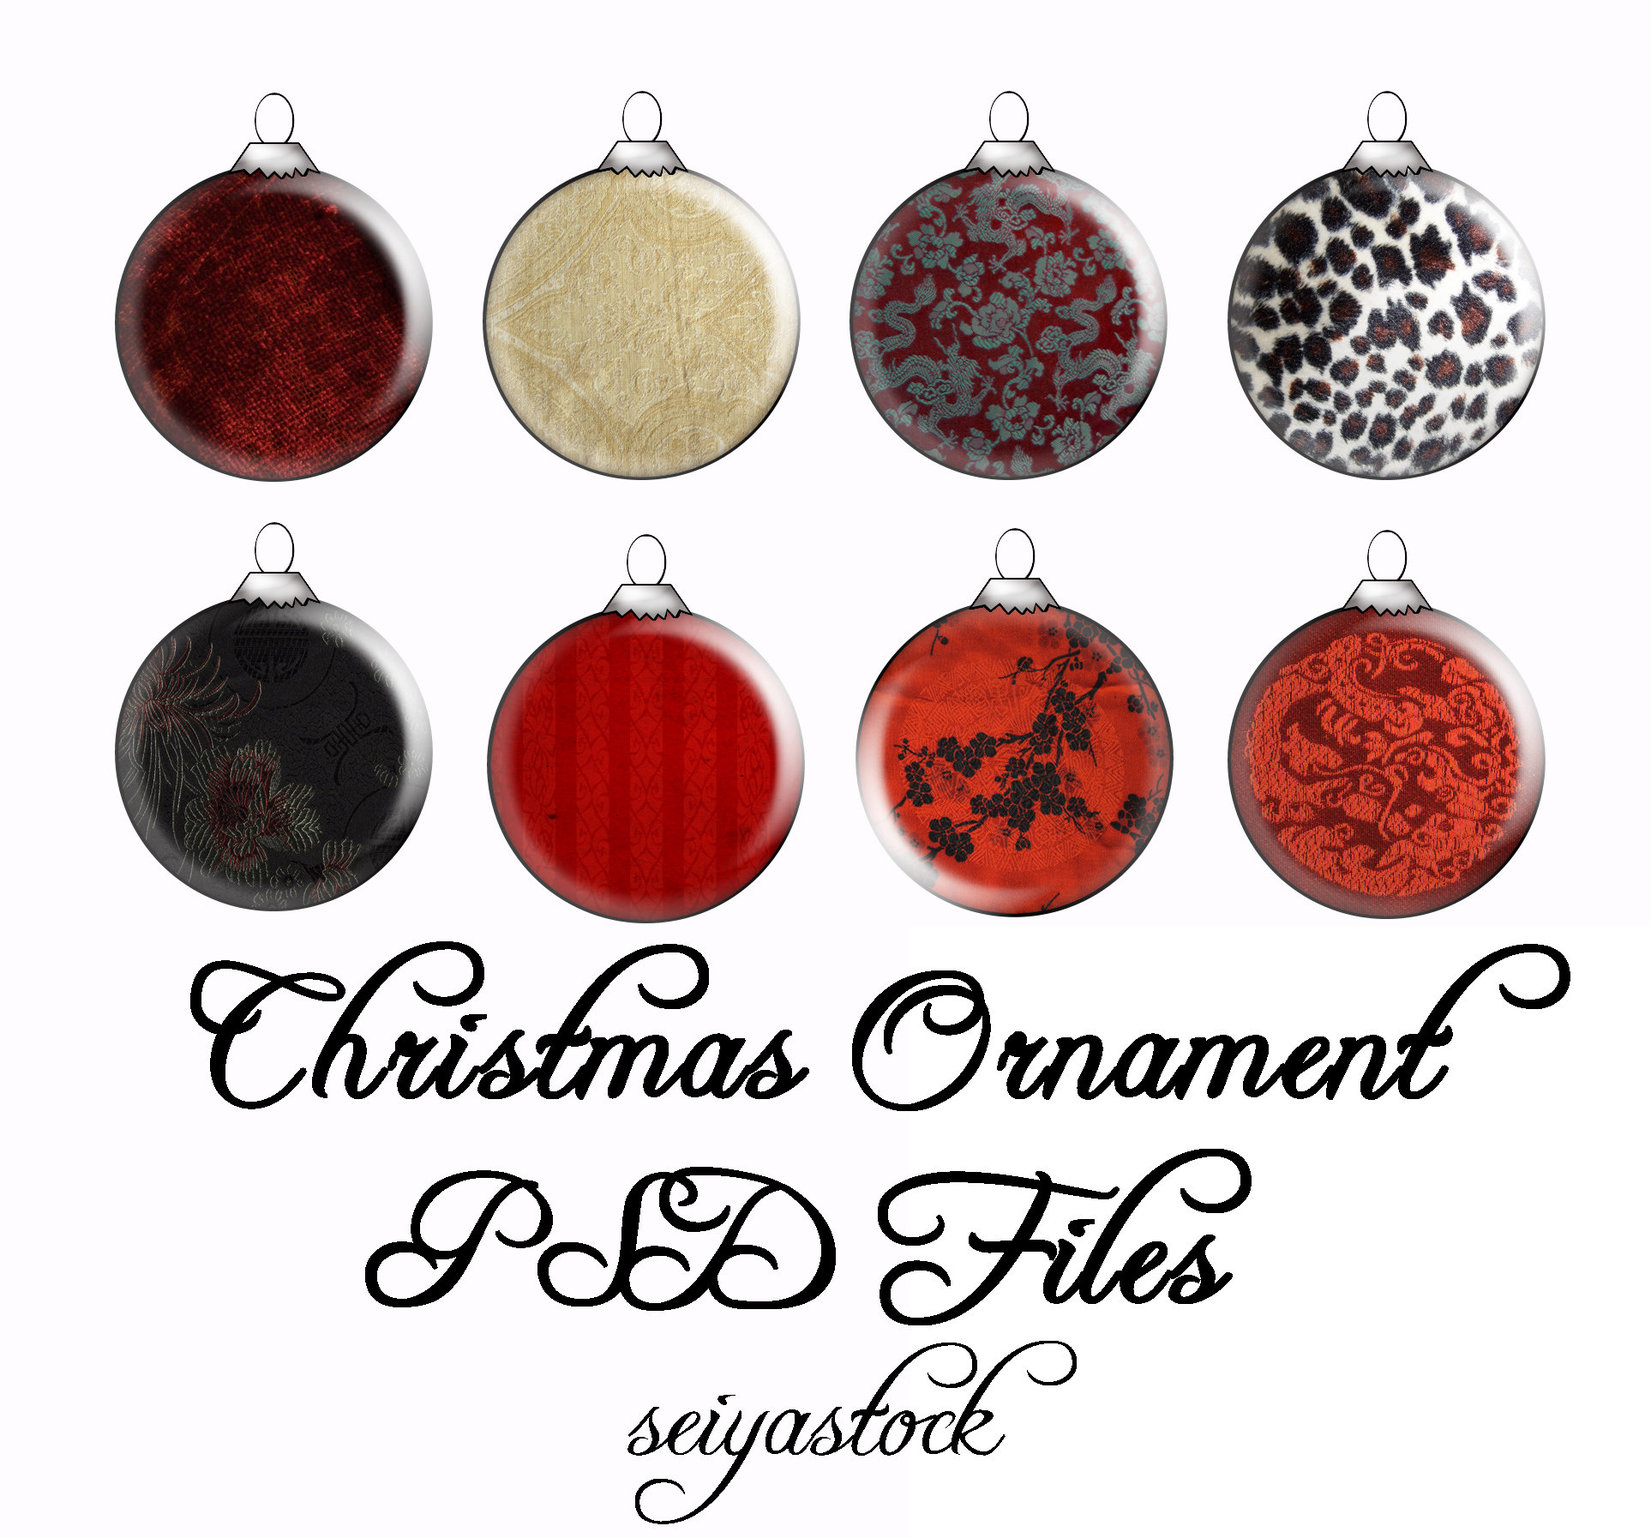 Christmas Ornament psd 1